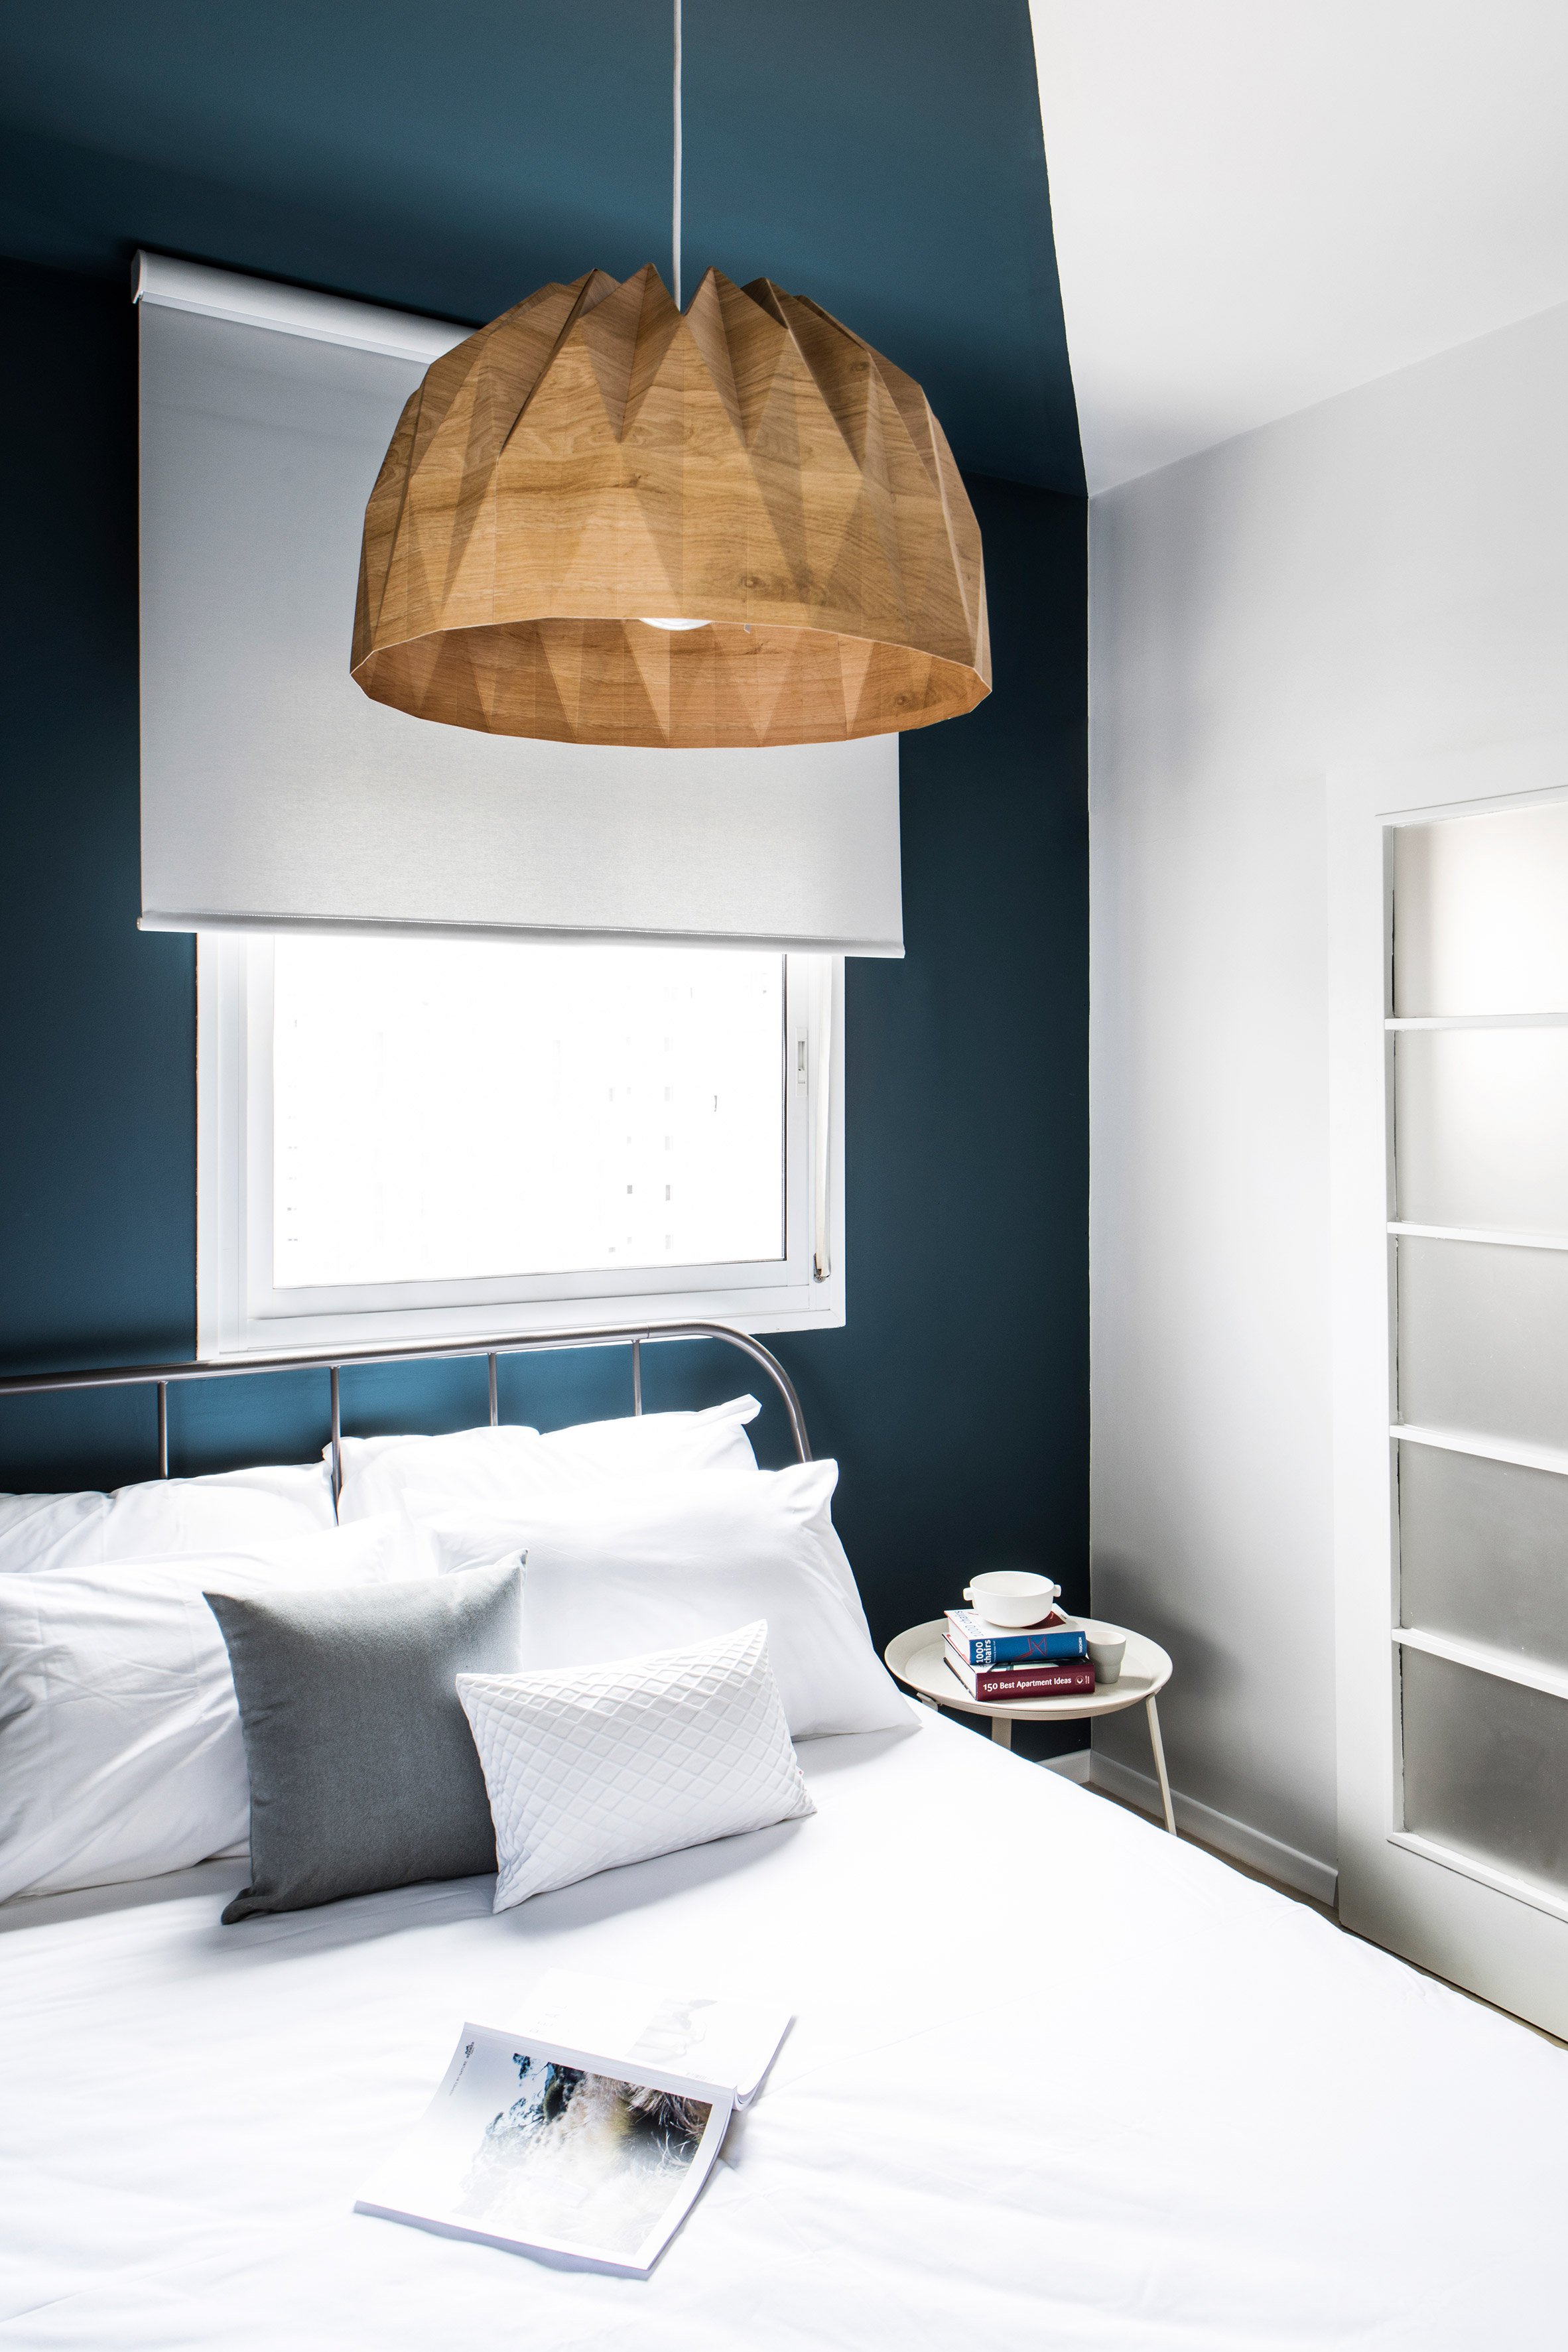 residence-interiors-design-studia-osnovadesign-osnova-poltava_06